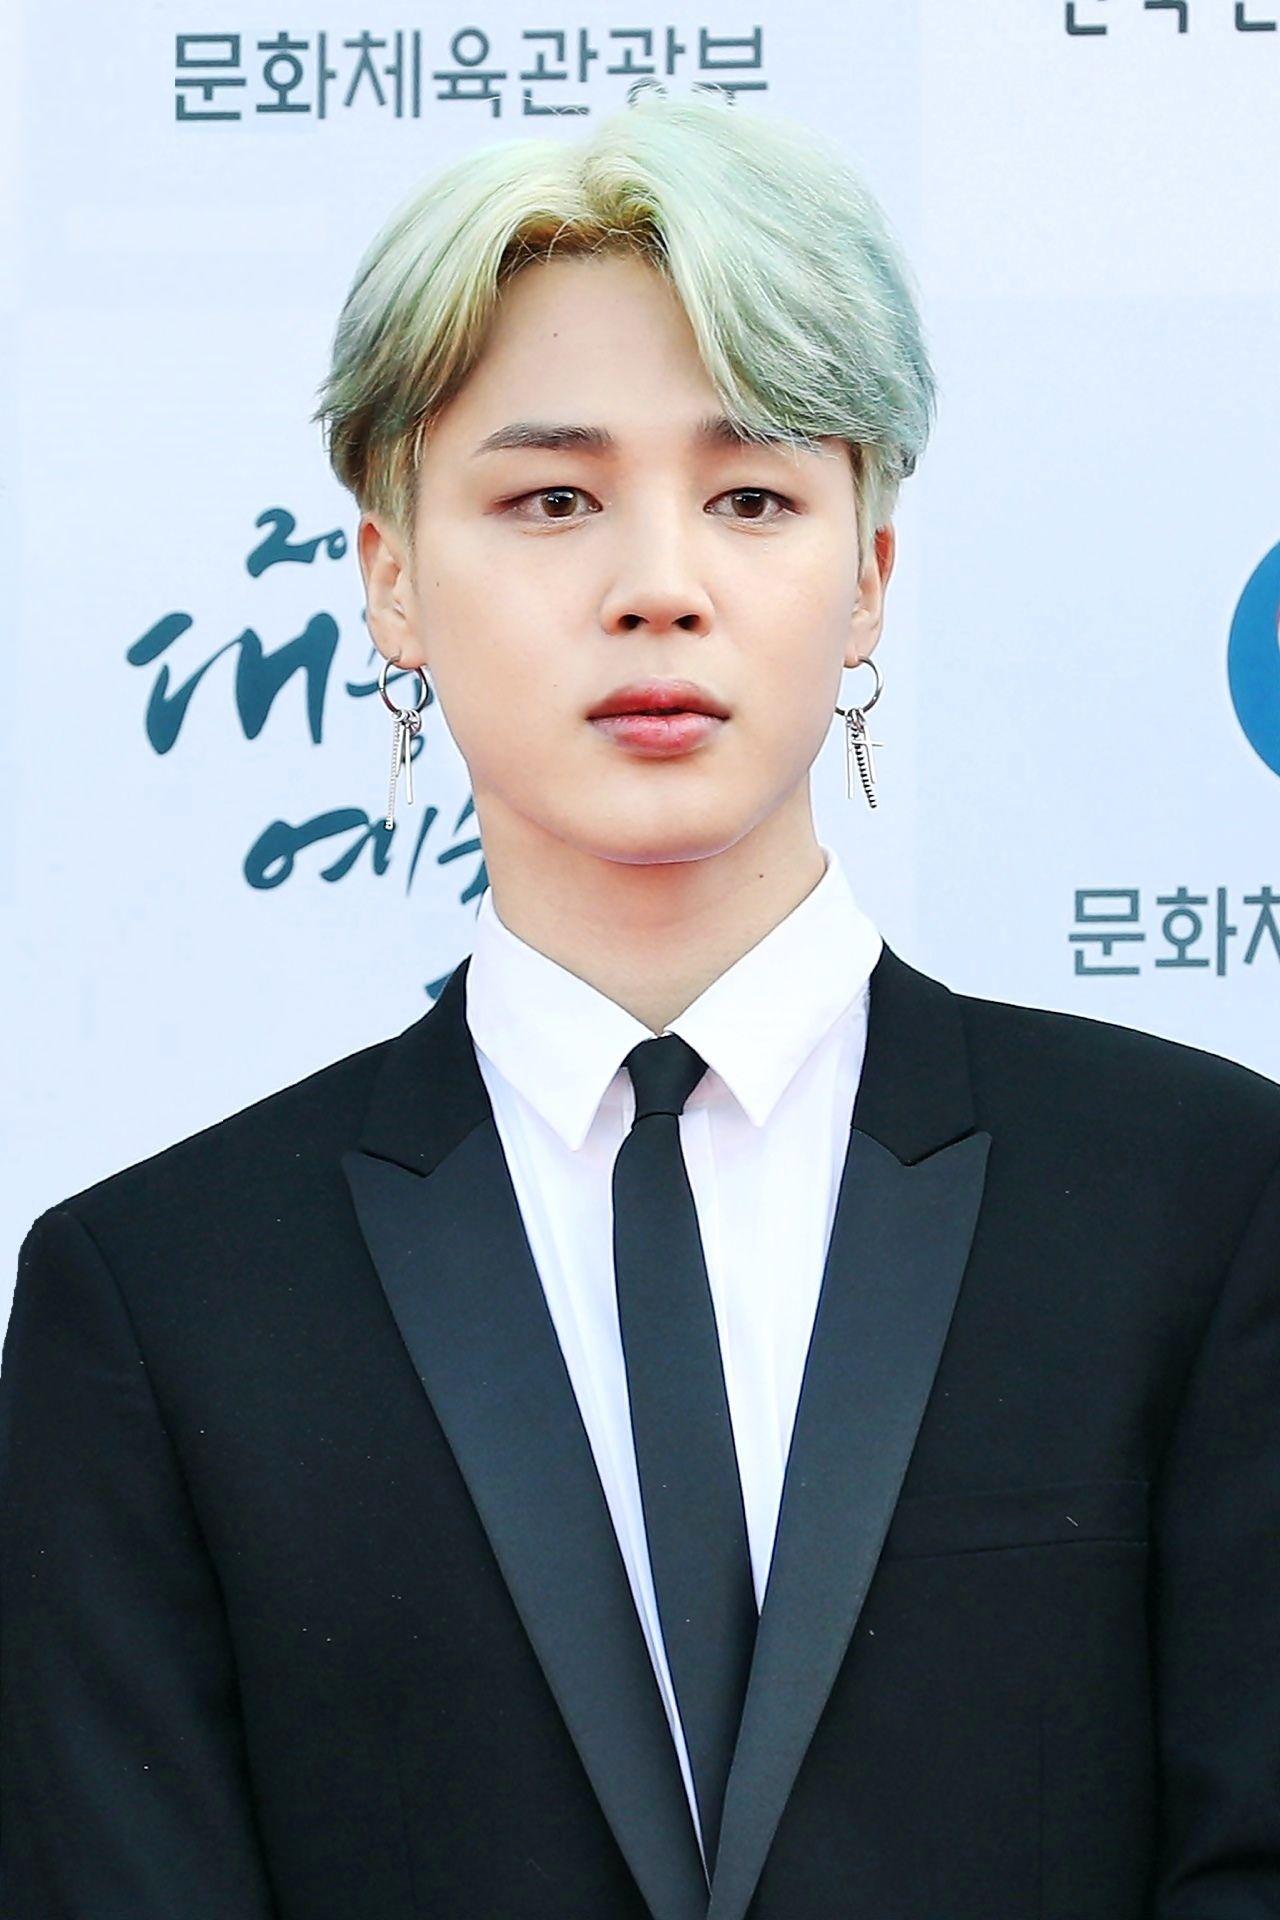 Park Jimin Photoshoot Bts At 2018 Korean Popular Culture And Entertainment Awards Credits By Idol League Bts Jimin Parkjimin Awards 2018 Popular Cu